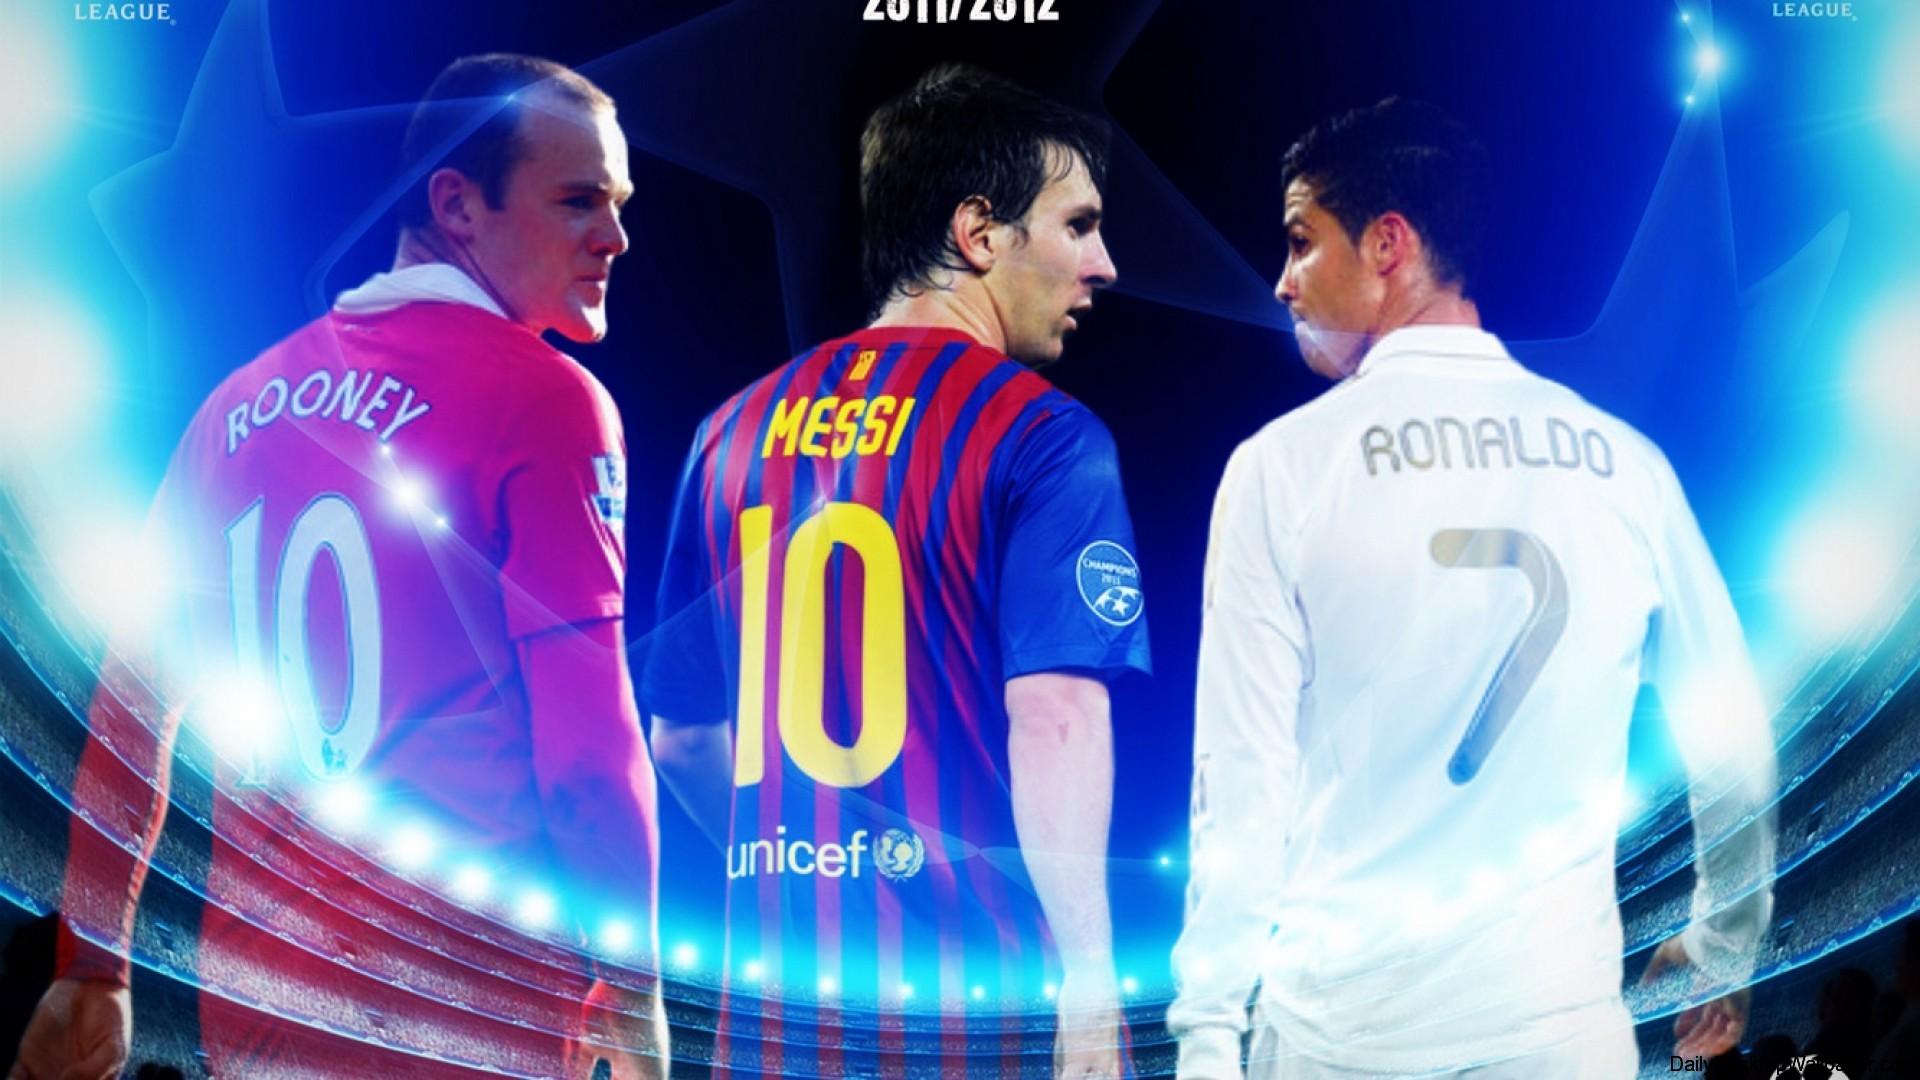 Download champions league 2011 2012 wallpaper HD wallpaper 1920x1080